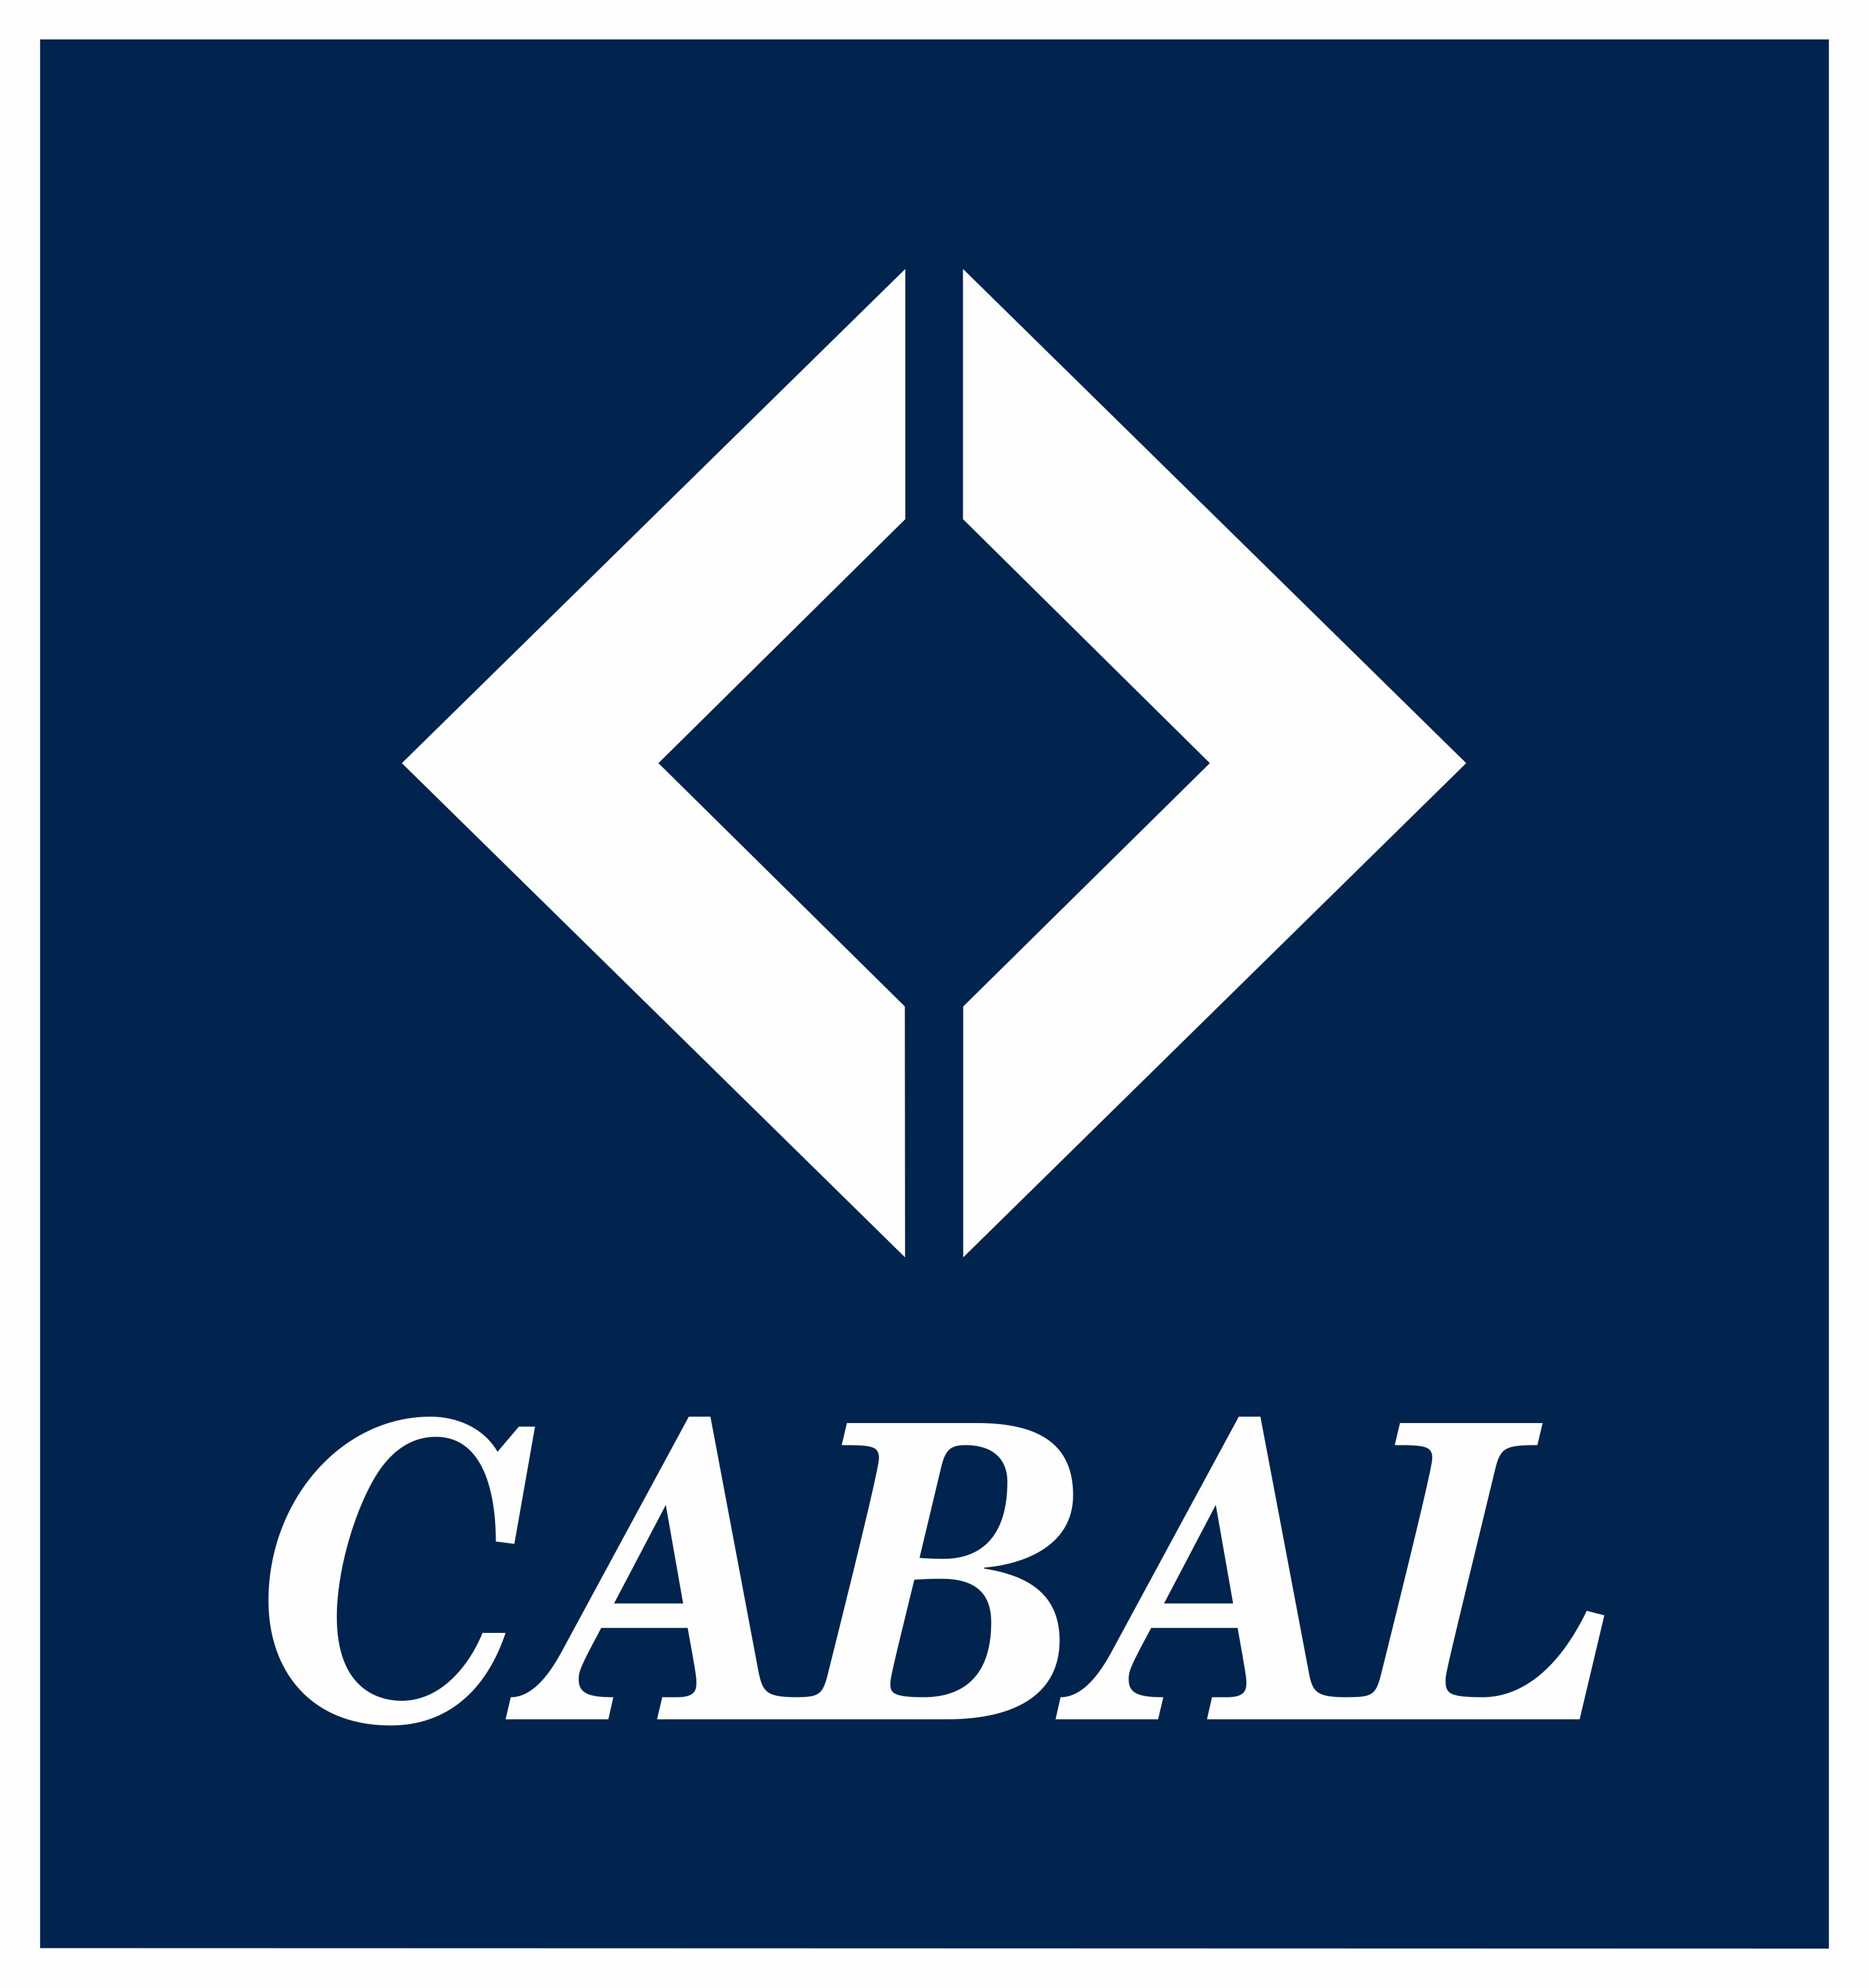 cabal logo cartao - Cabal Logo - Cartão Cabal Logo